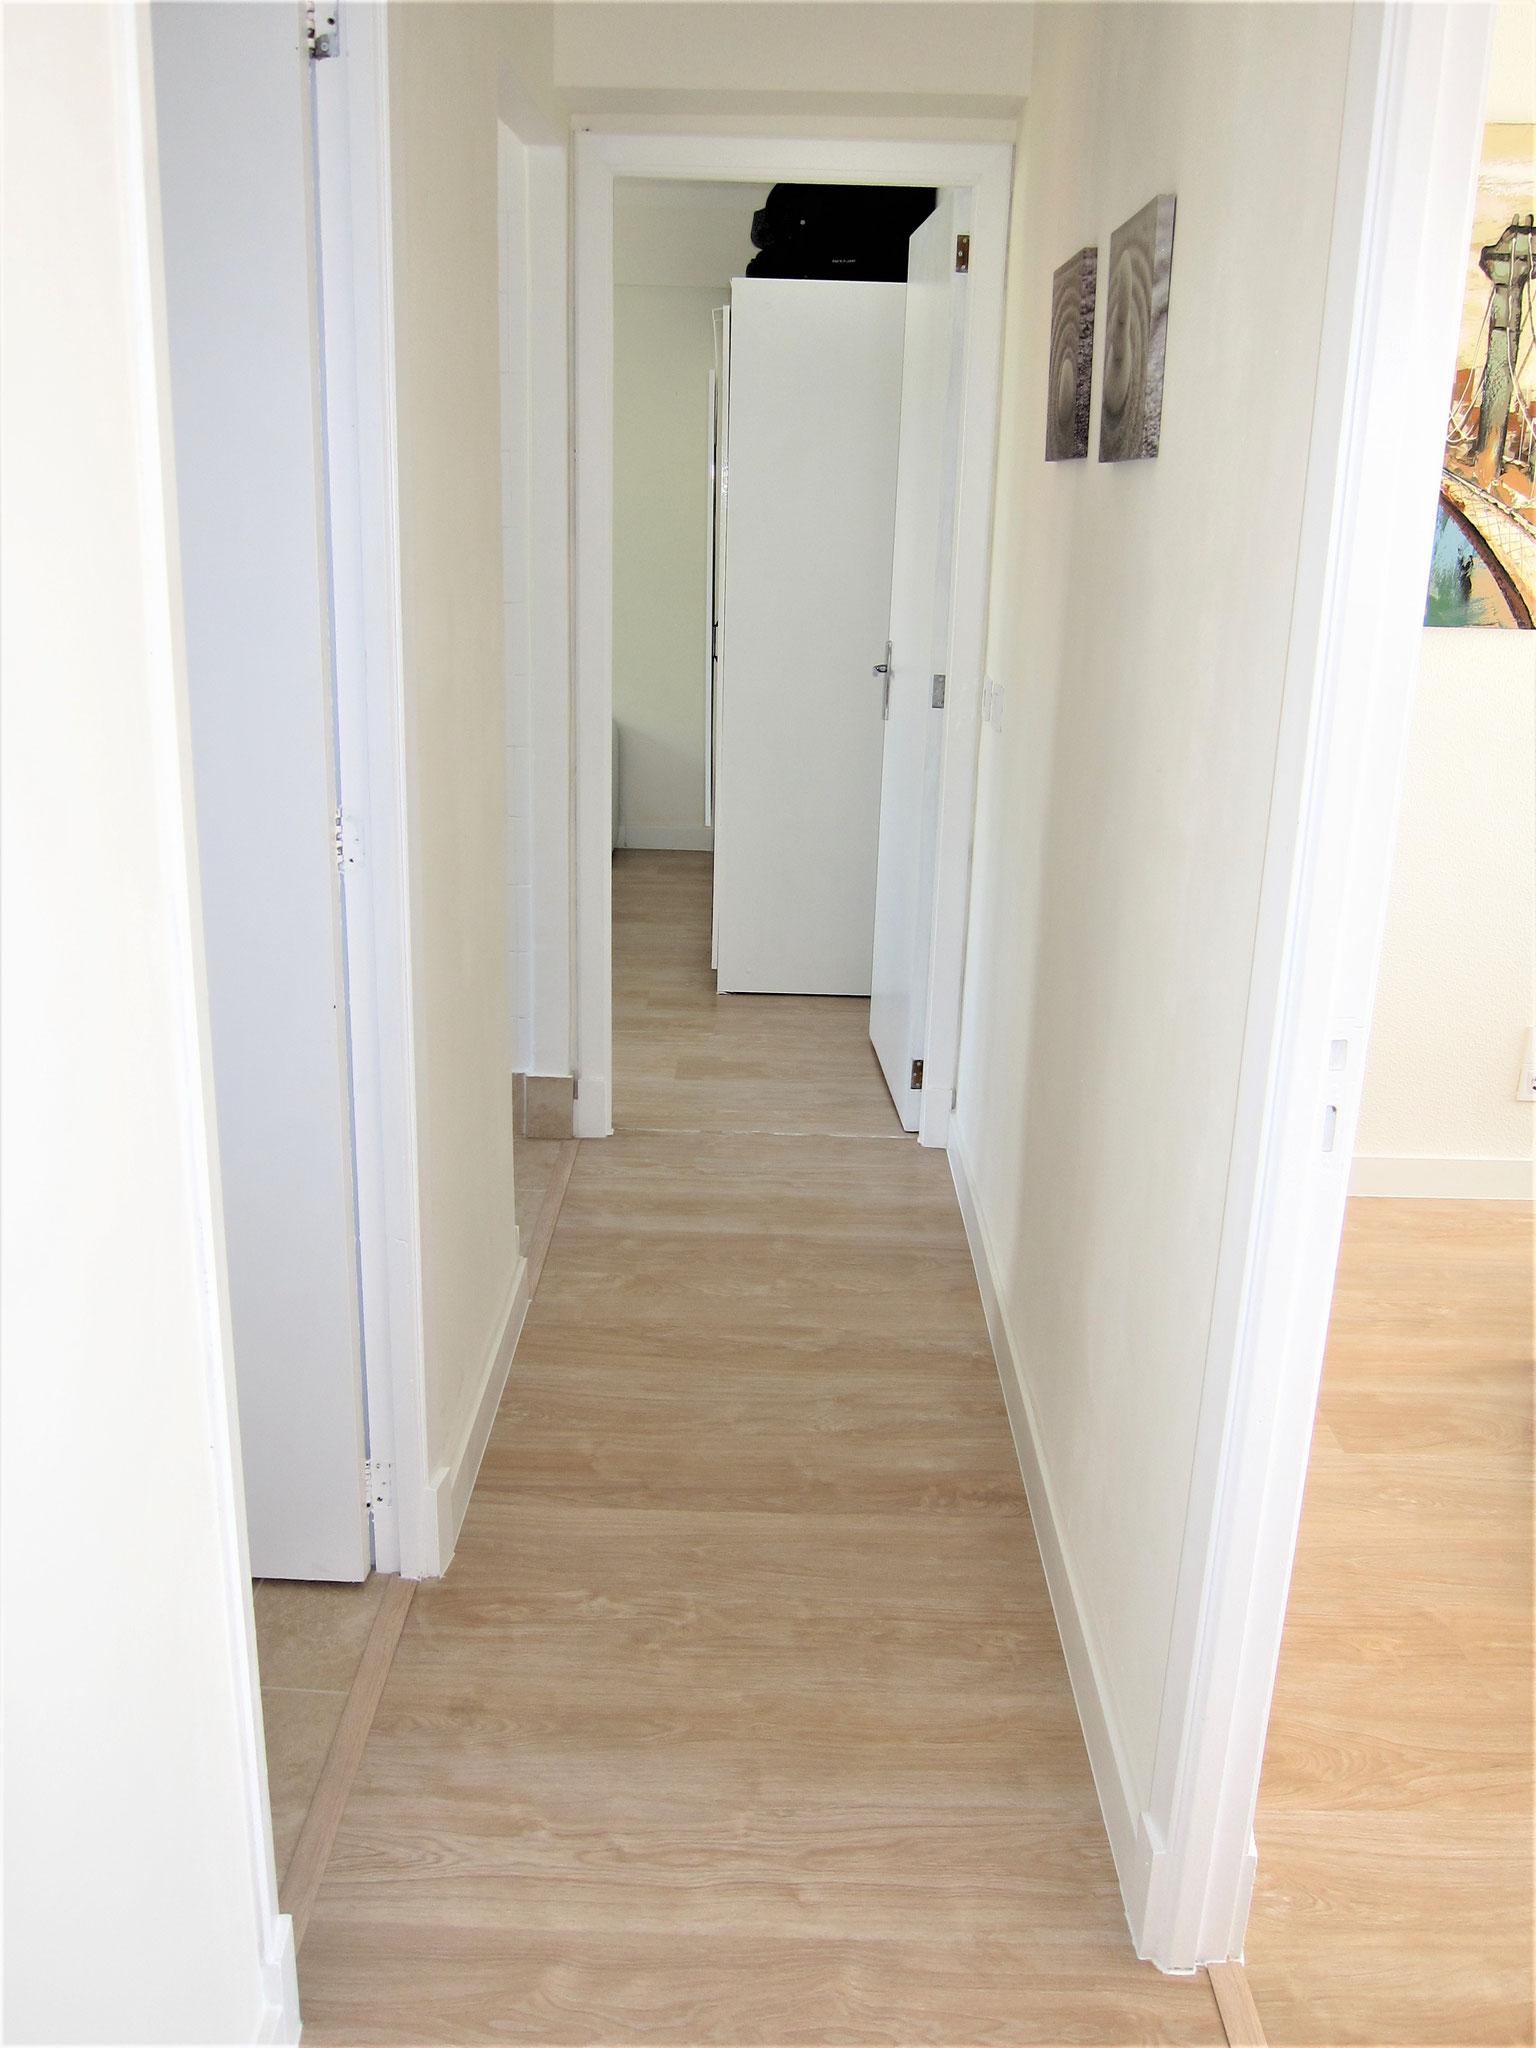 Hallway - After